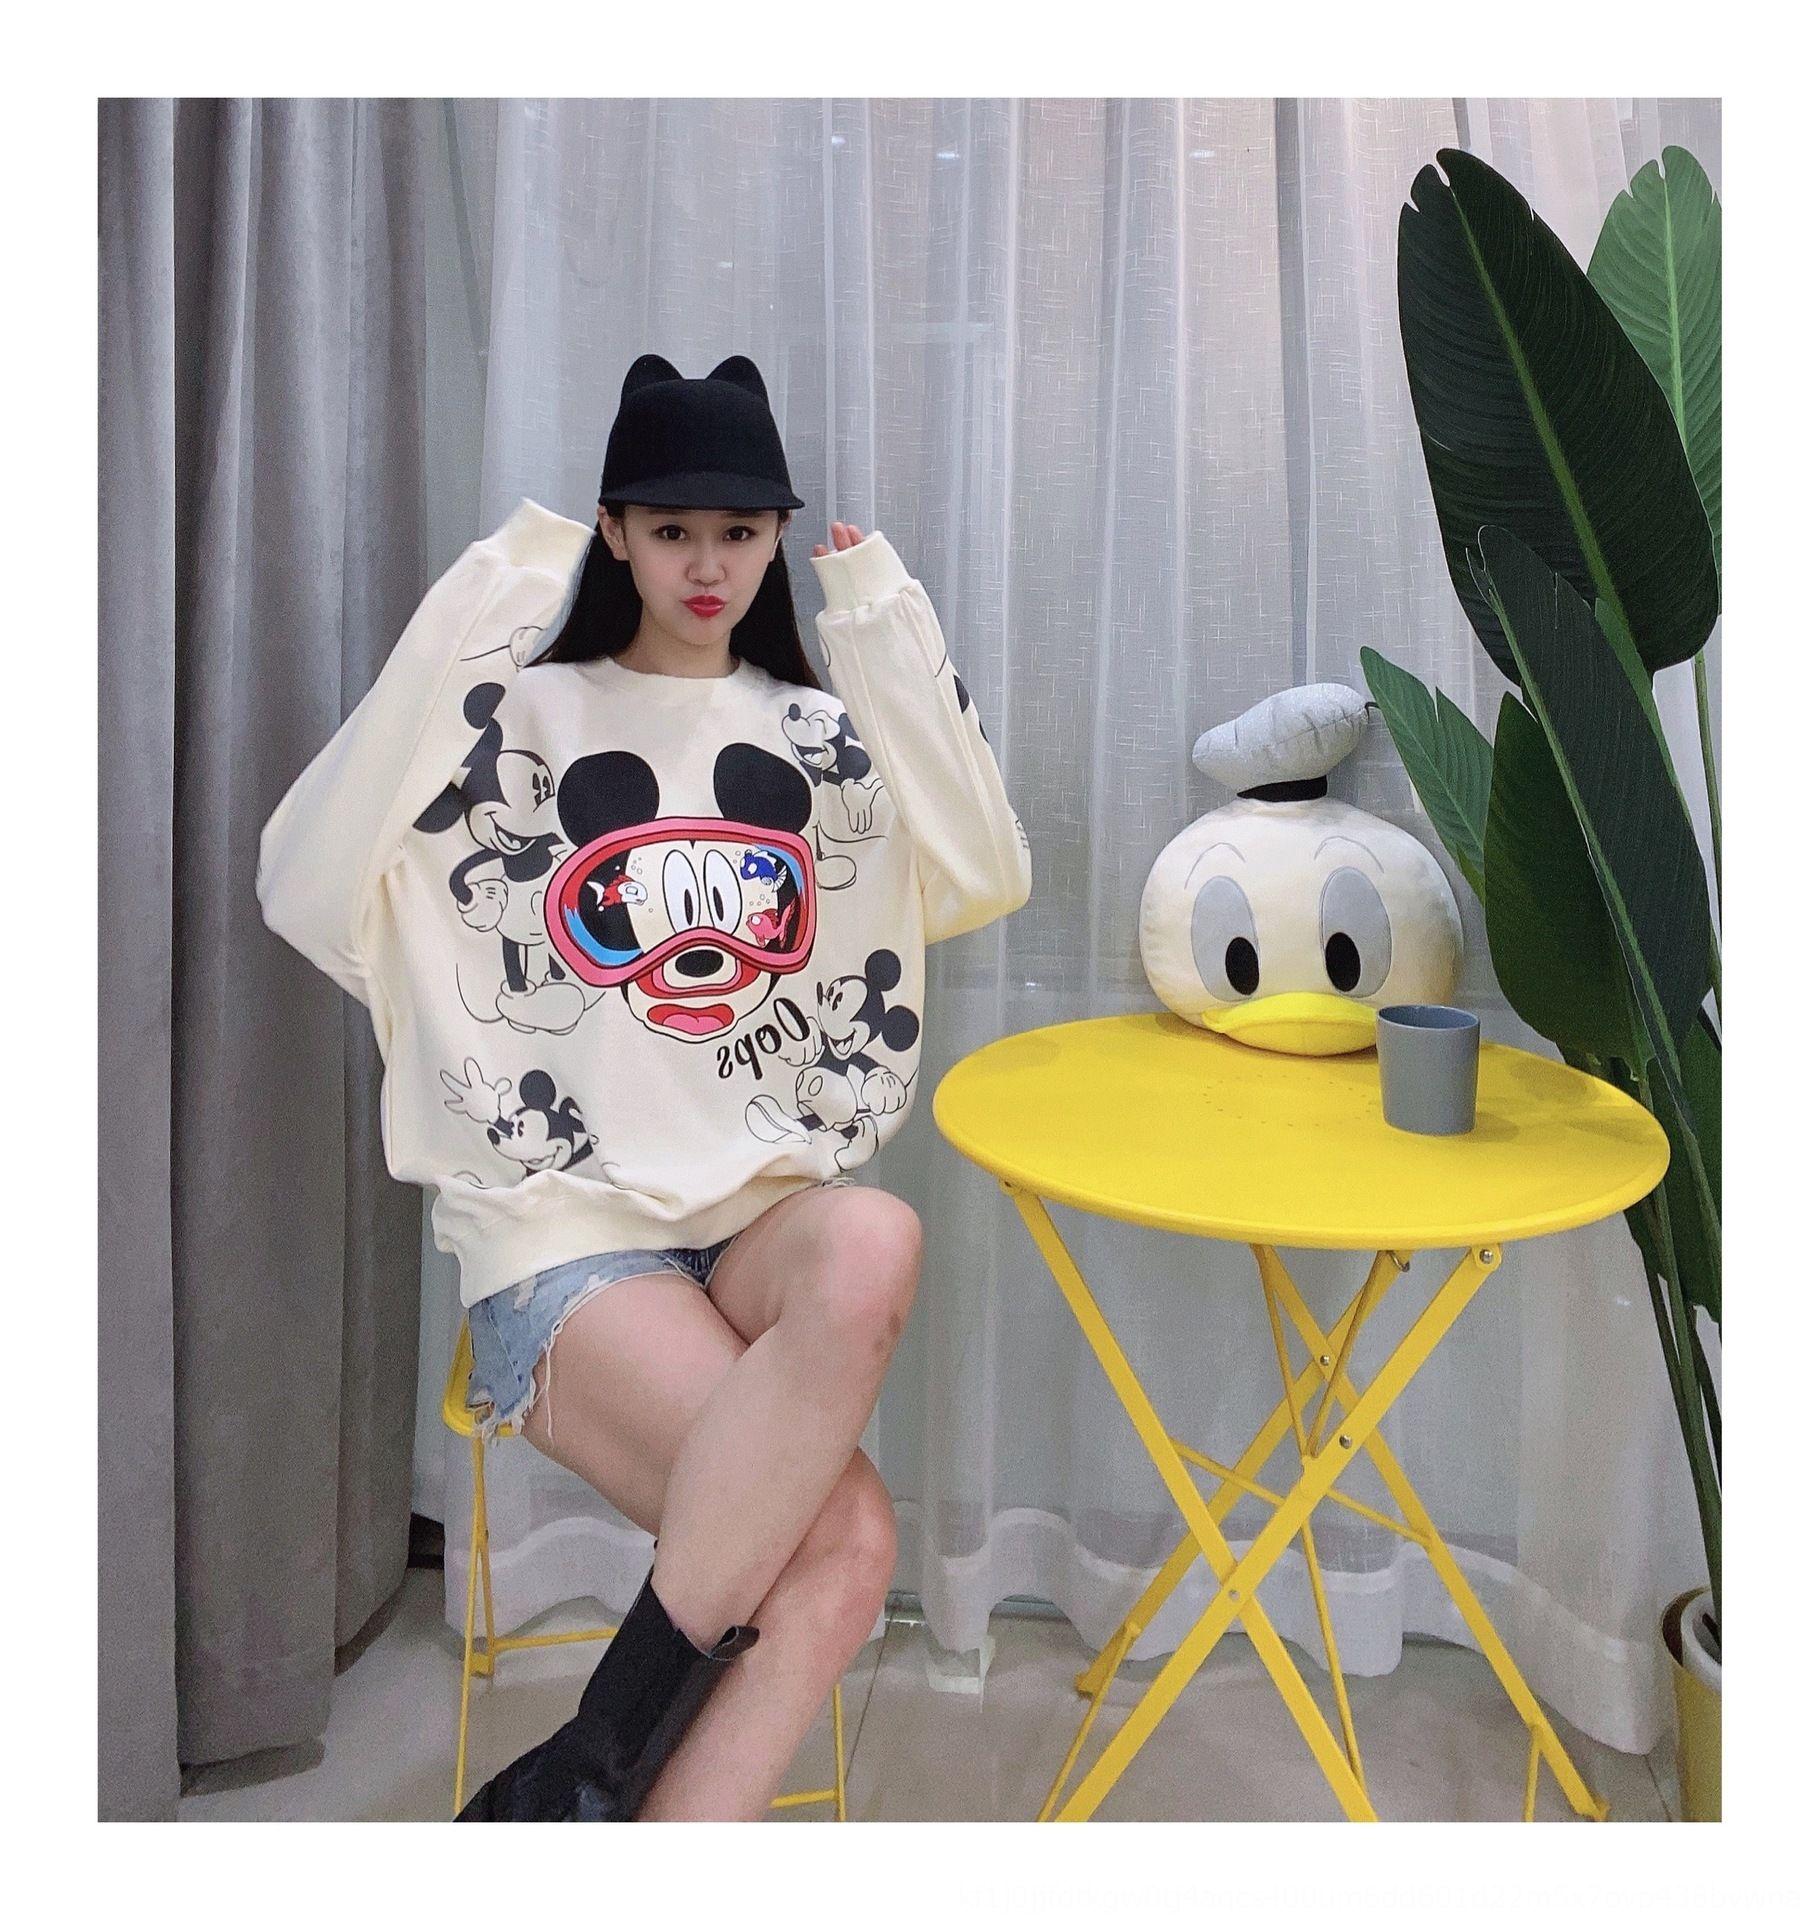 OvViD Frauen koreanische Art lose 2020 Herbst Pullover Top-Strickjacke Hülse langen Rundhals Pullover Karikatur Pullover Herbst neuen reinen Baumwollobers